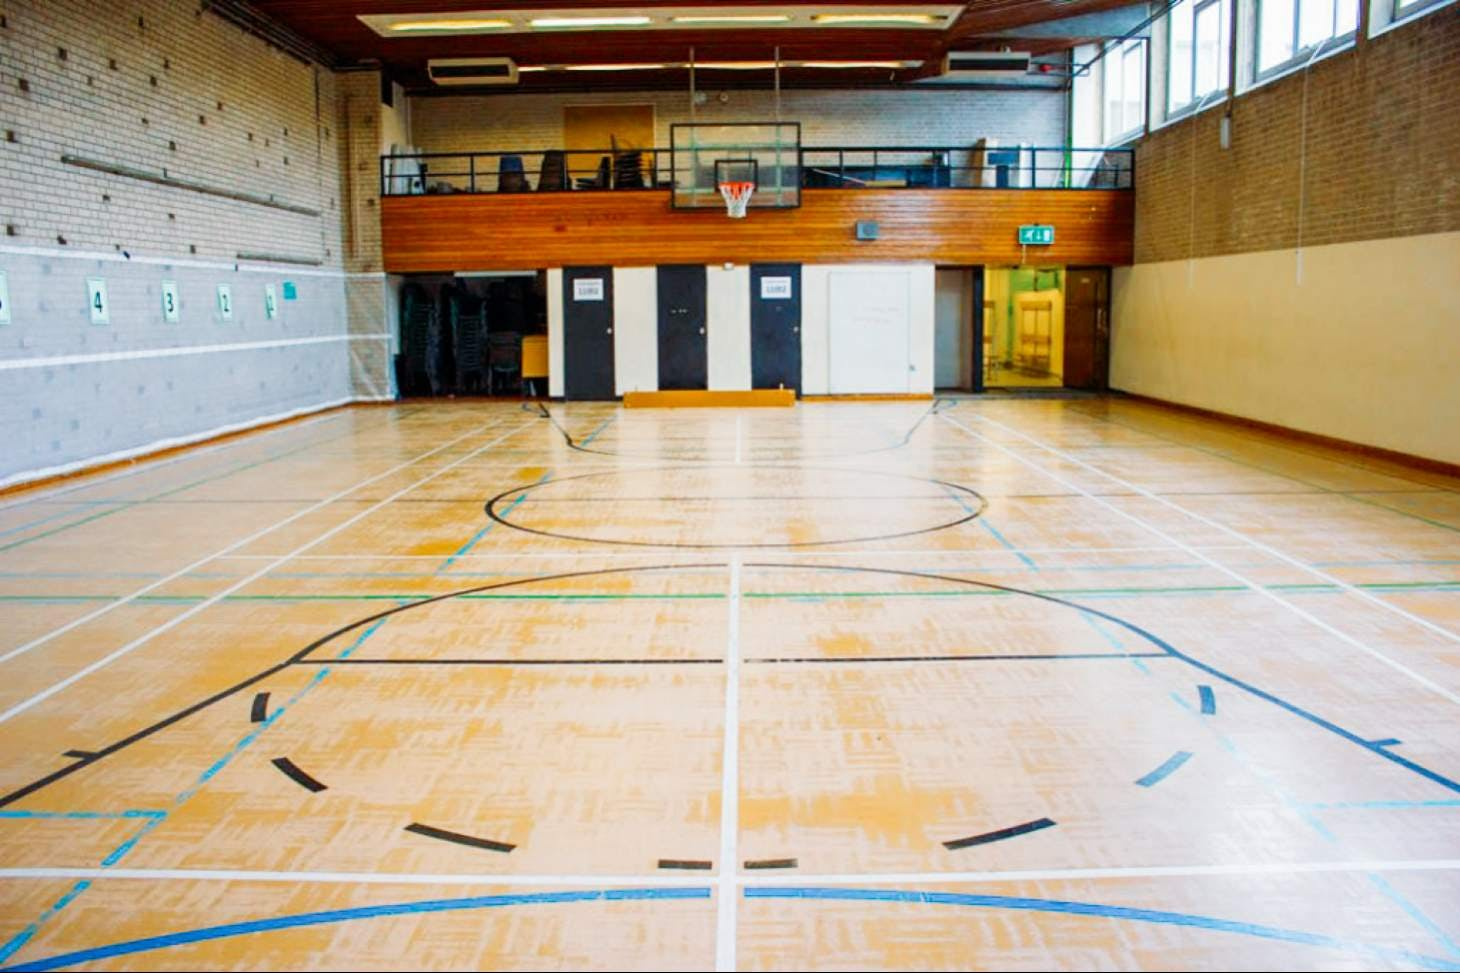 Harris Academy Battersea Gymnasium space hire